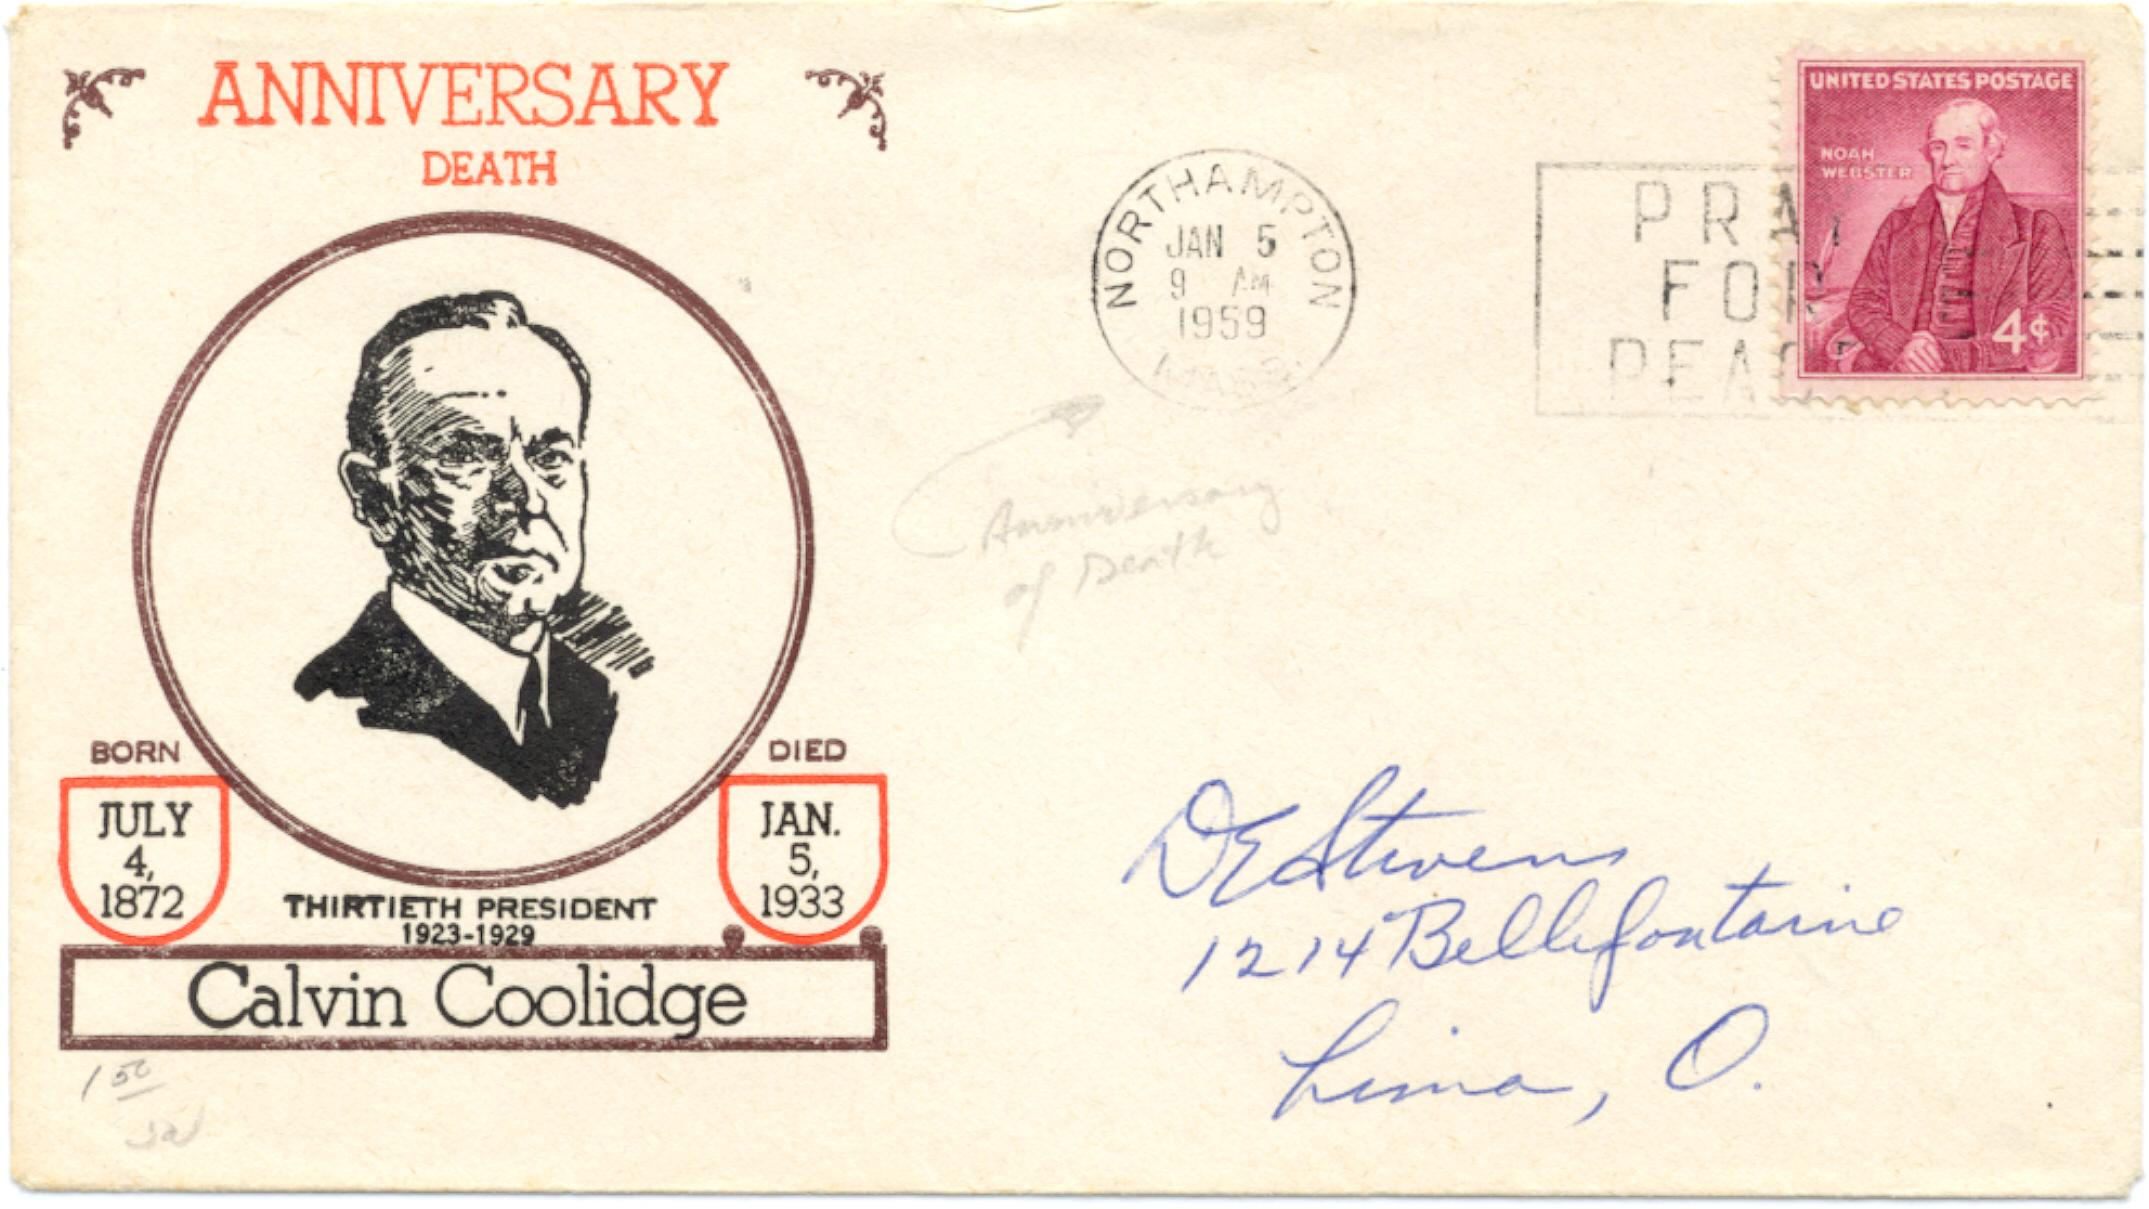 Coolidge Death Anniversary 59-01-05